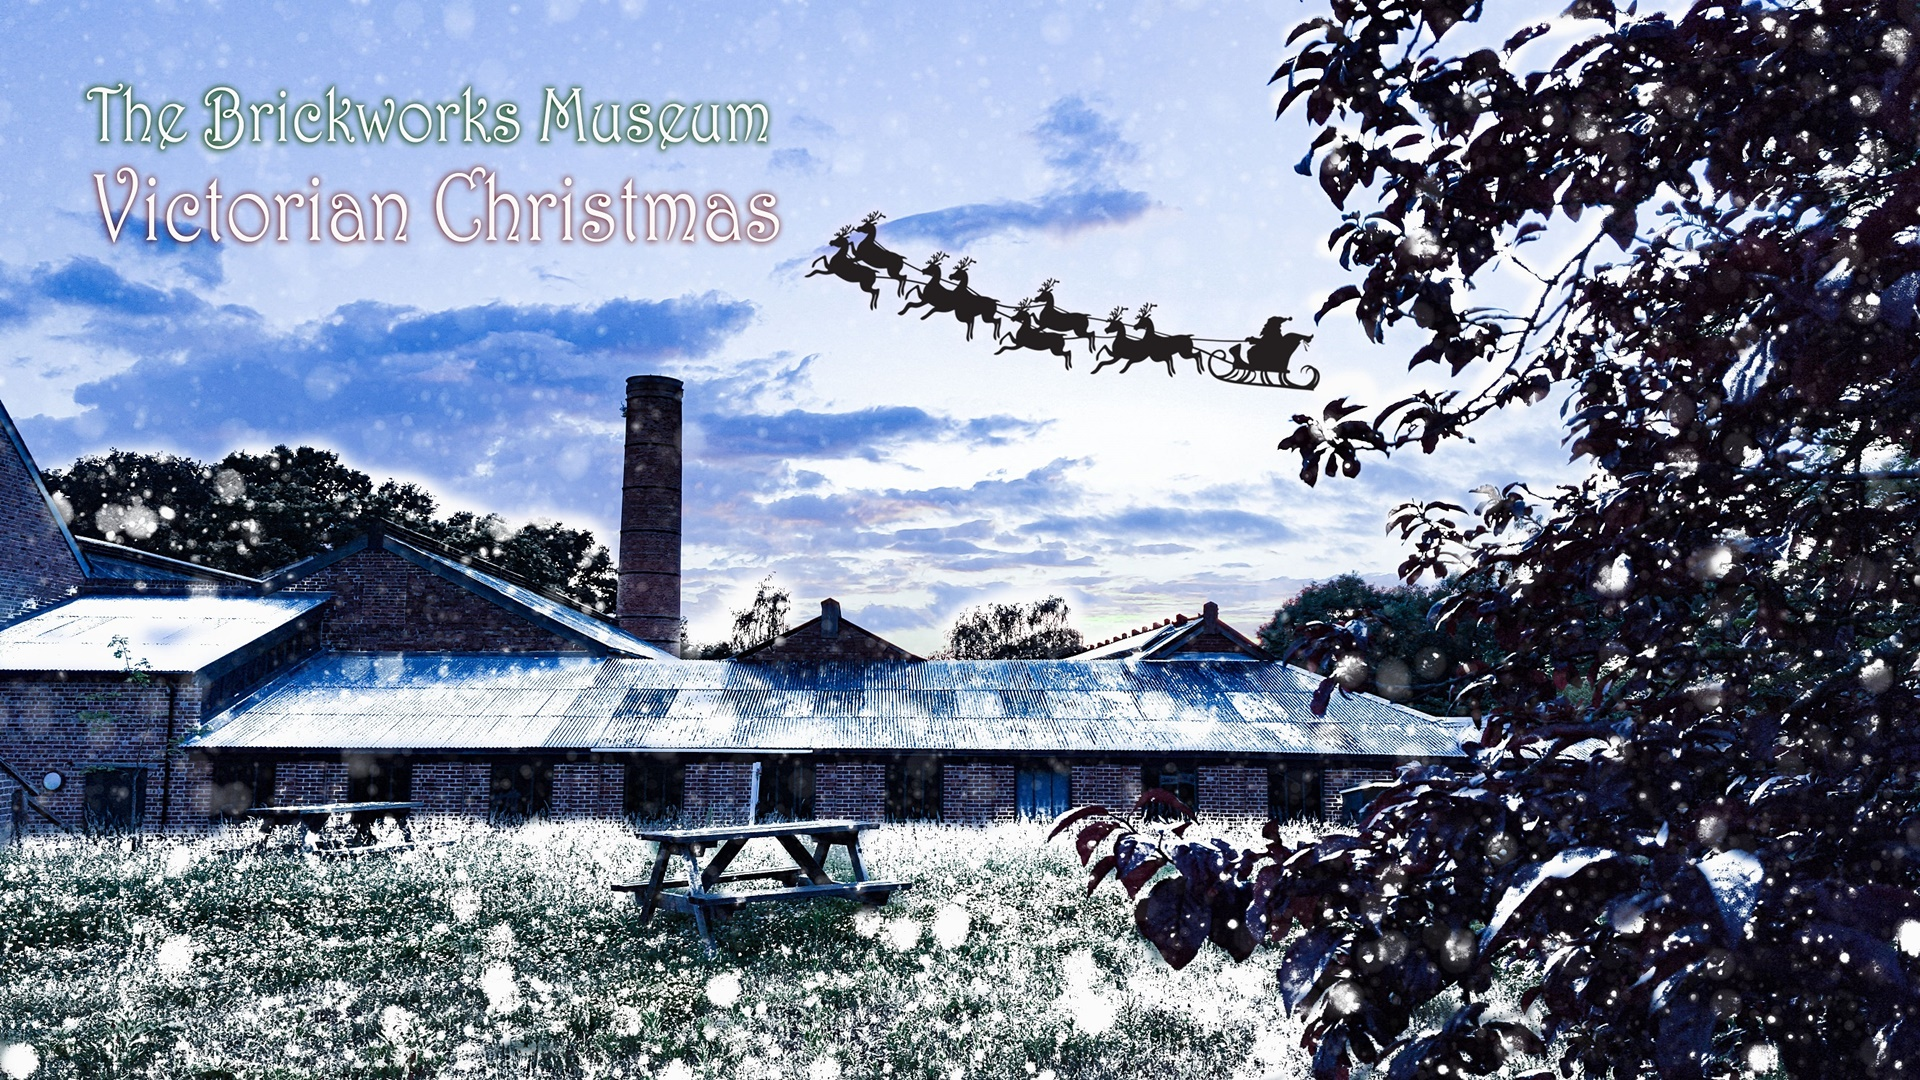 Brickworks Museum Victorian Christmas